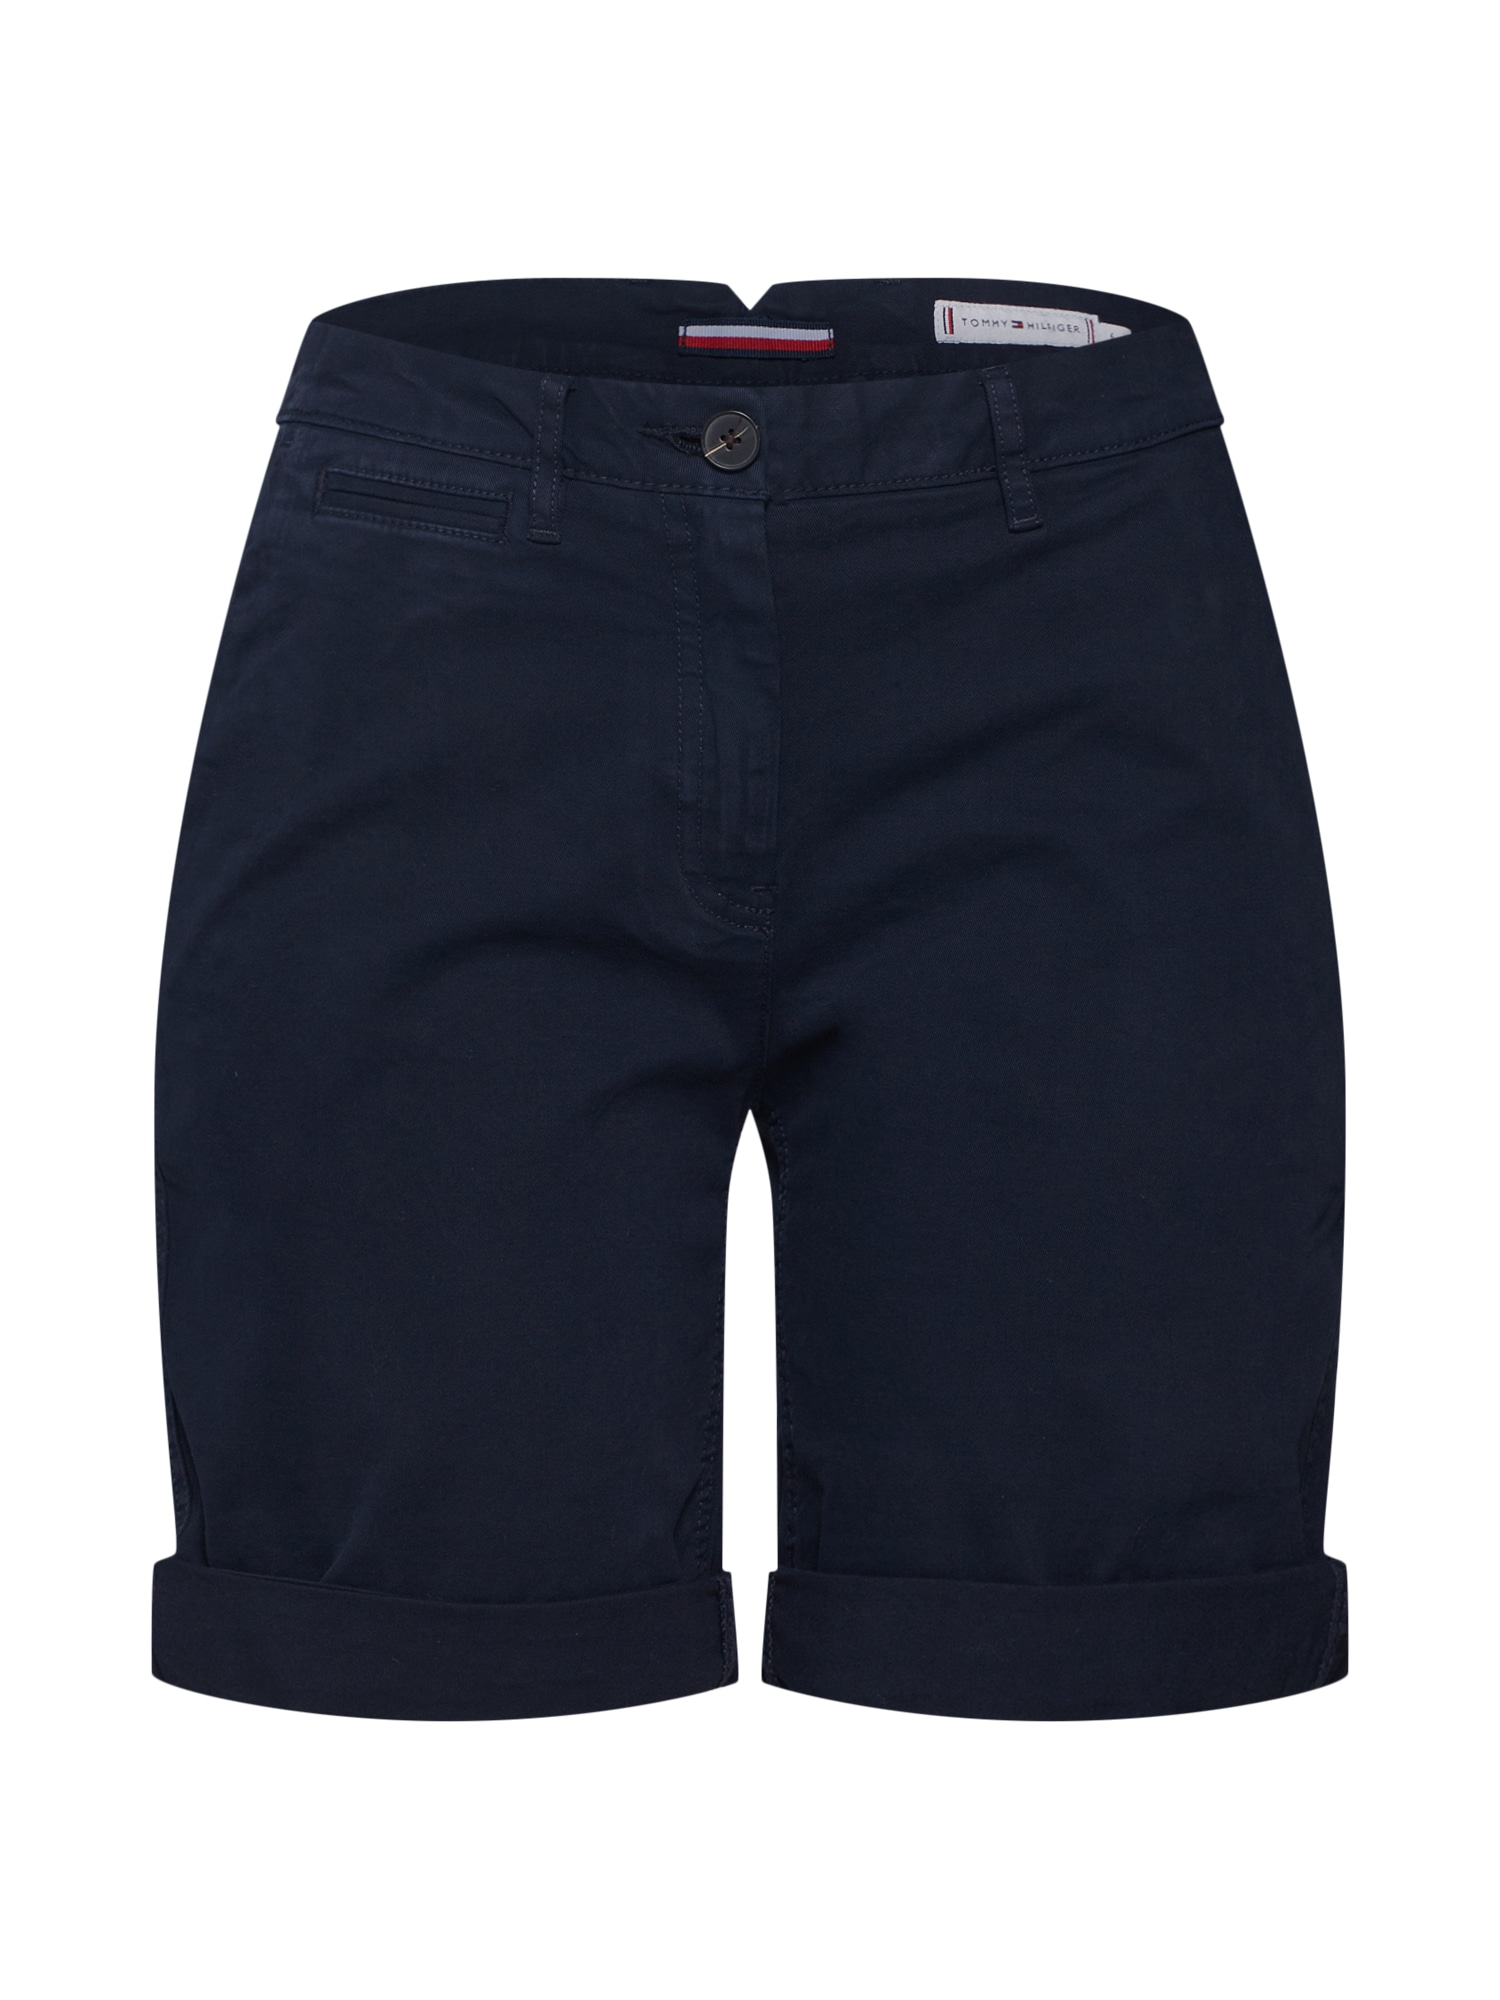 Chino kalhoty Hunter modrá marine modrá TOMMY HILFIGER